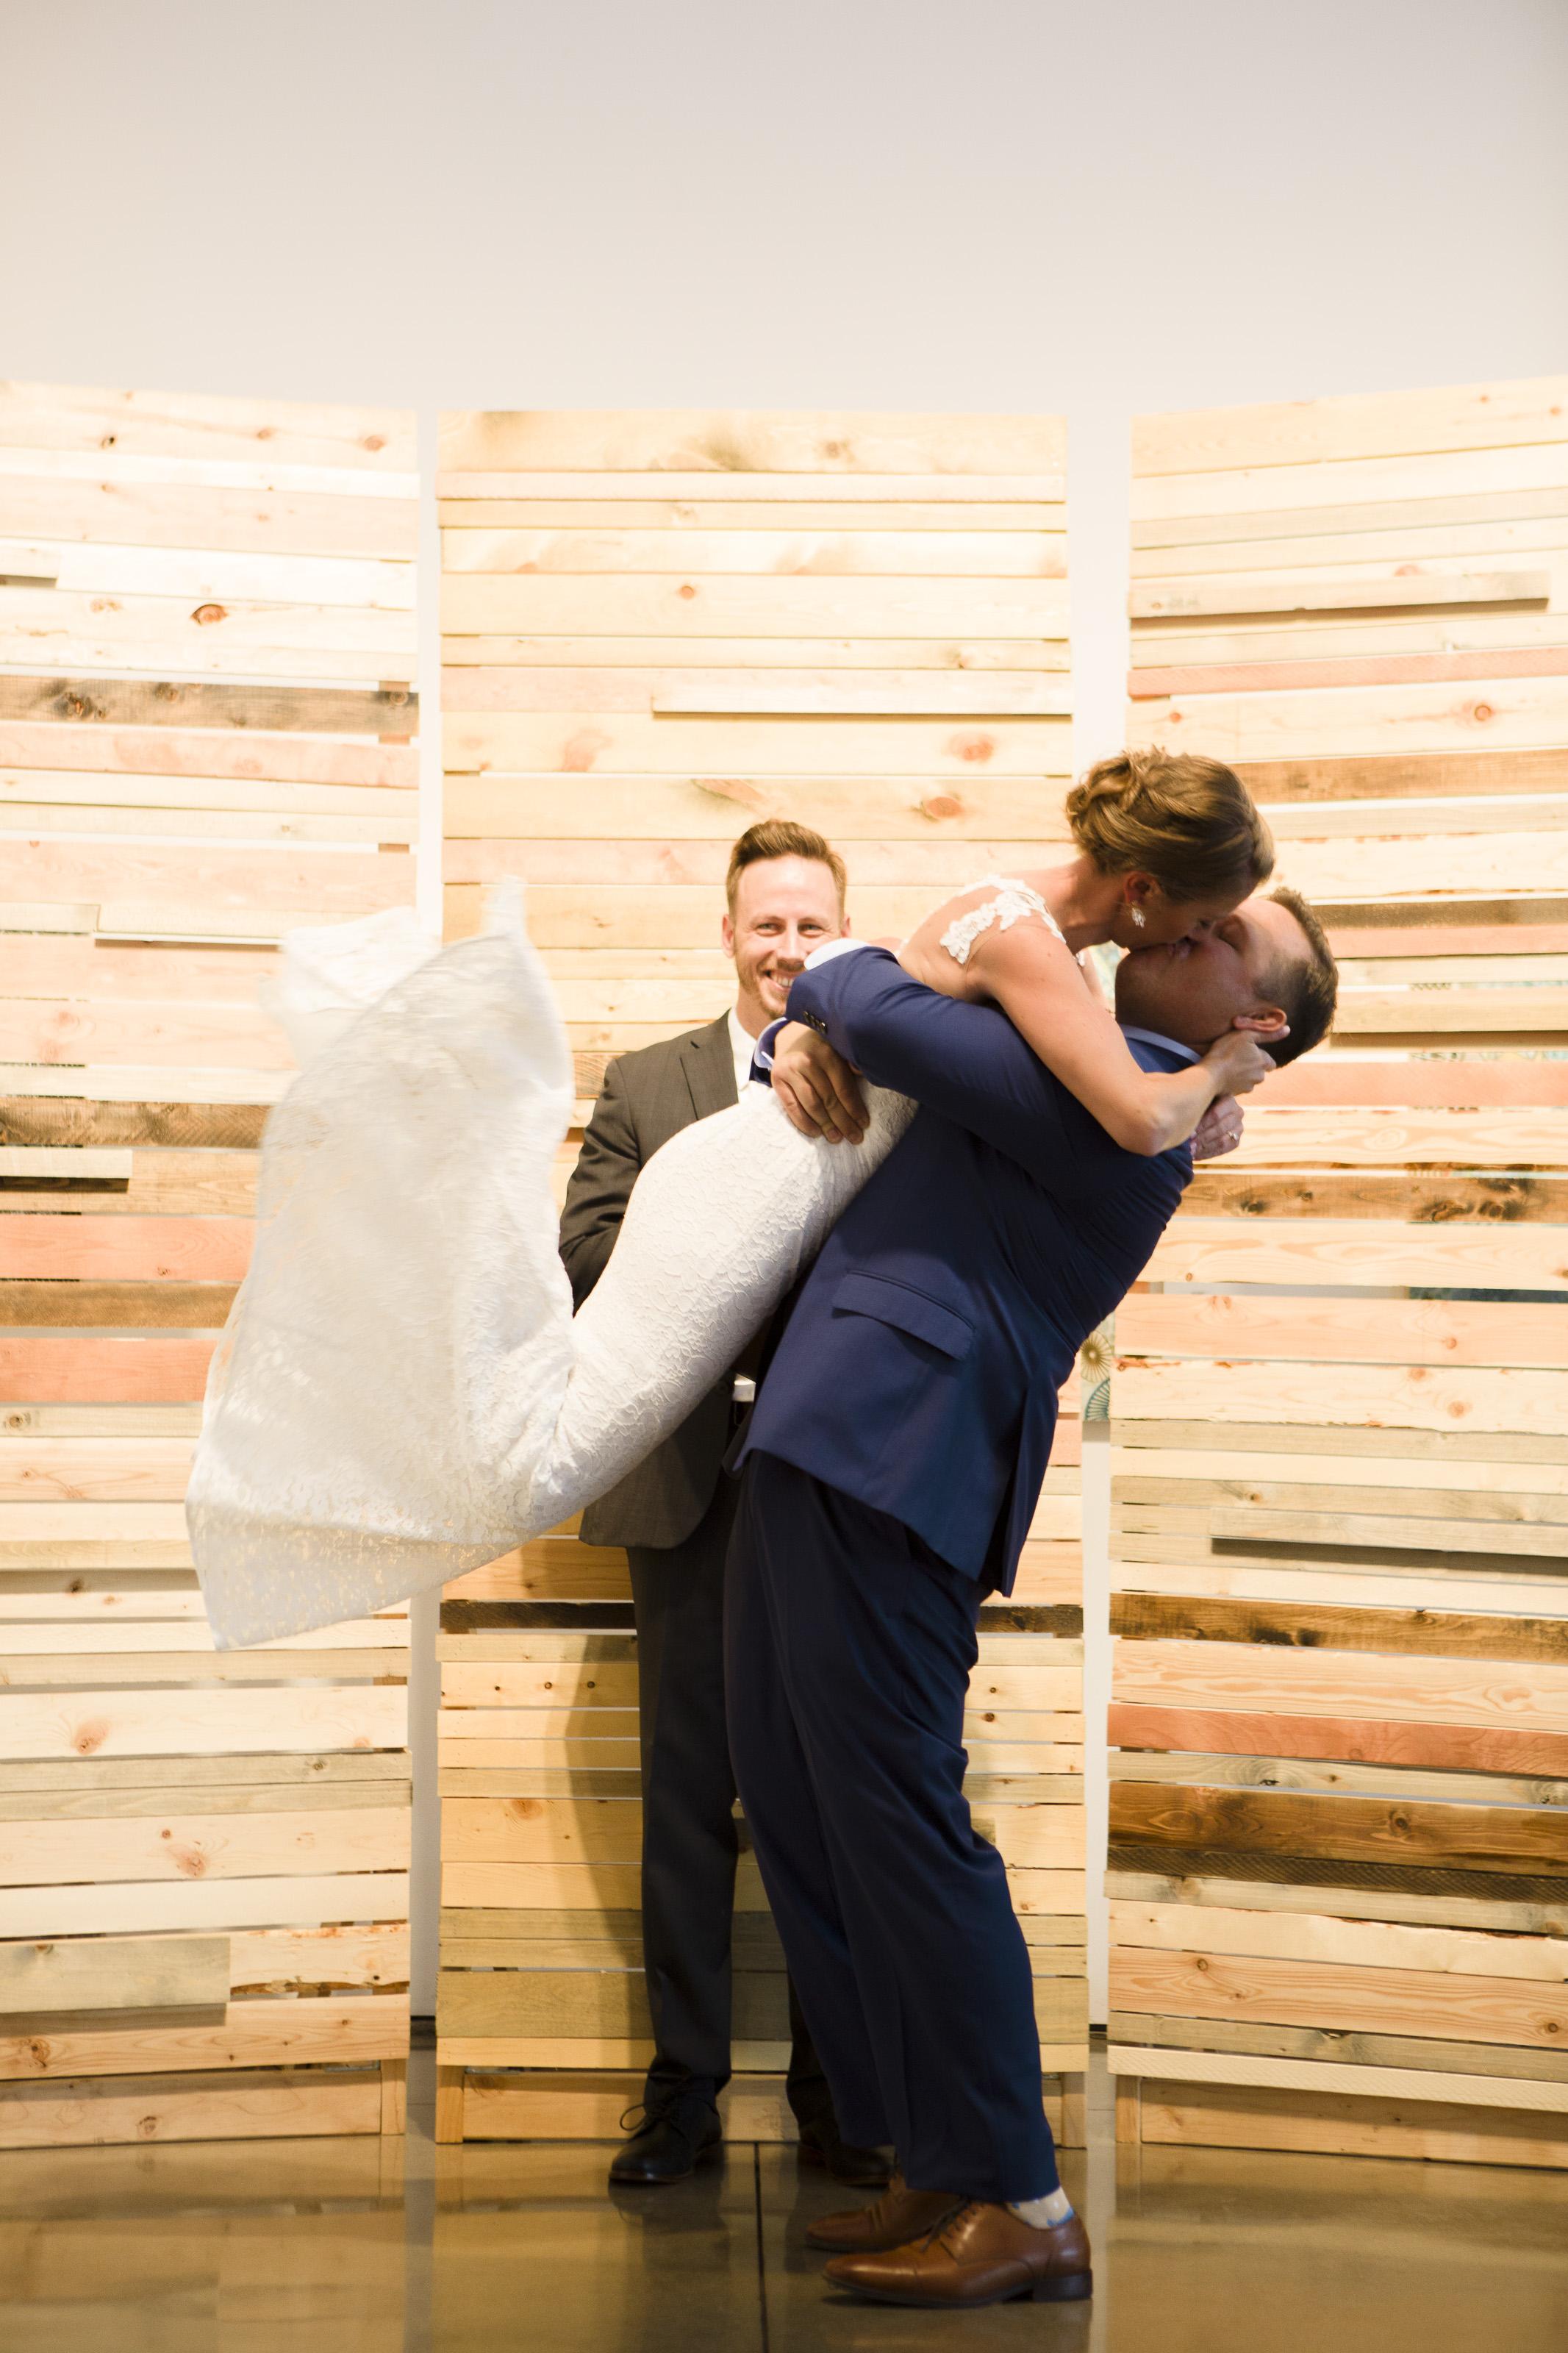 kristen-vance-space-gallery-denver-colorado-wedding-2017.jpg